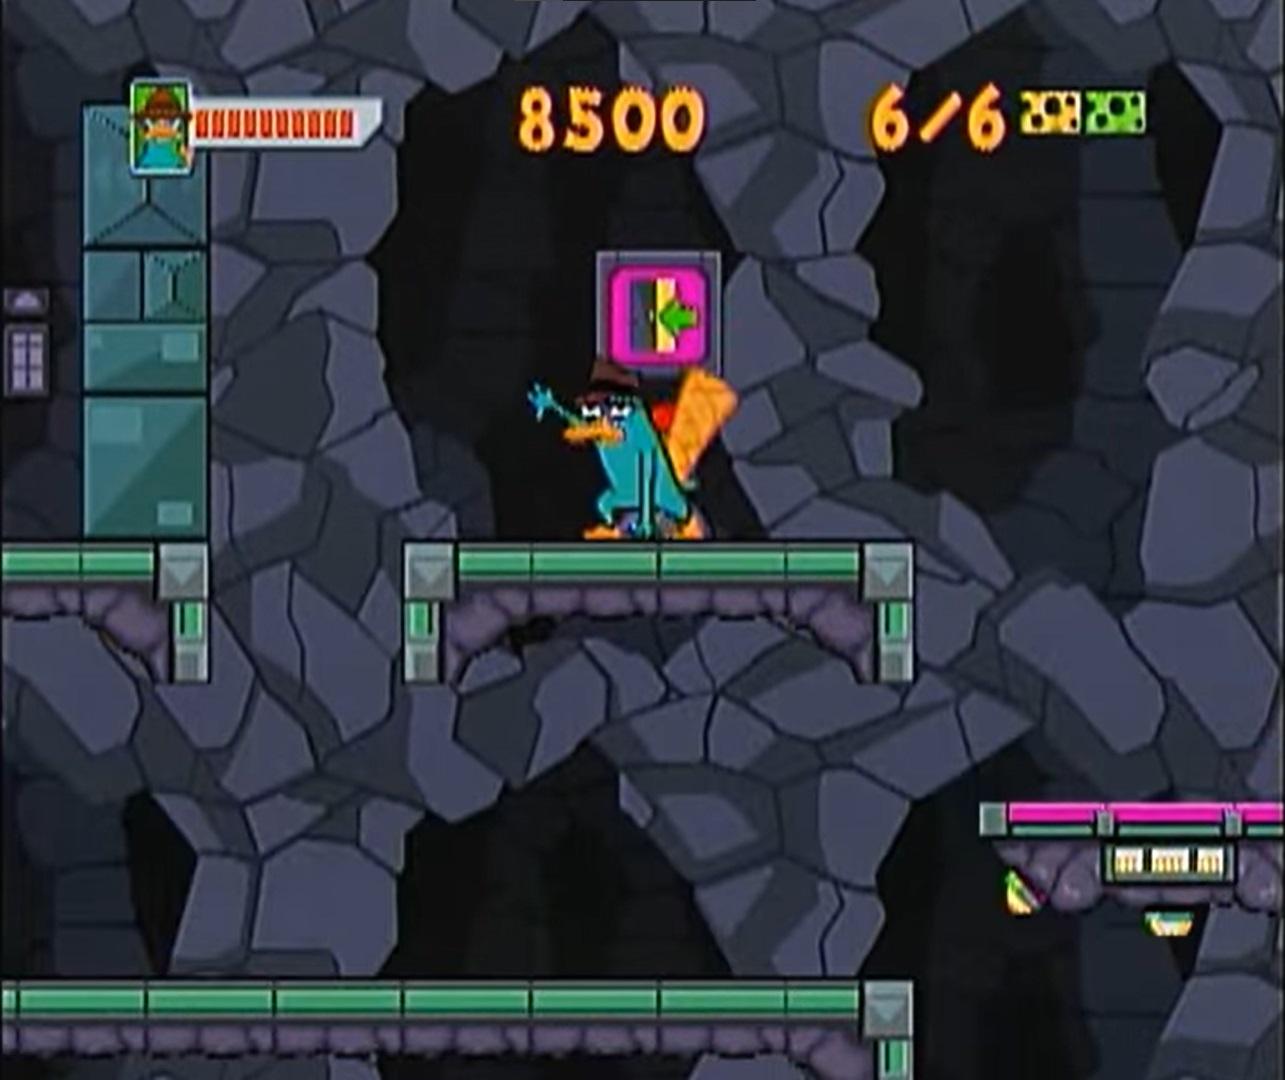 File:Best Game Ever! - Platypus Panic screenshot.jpg